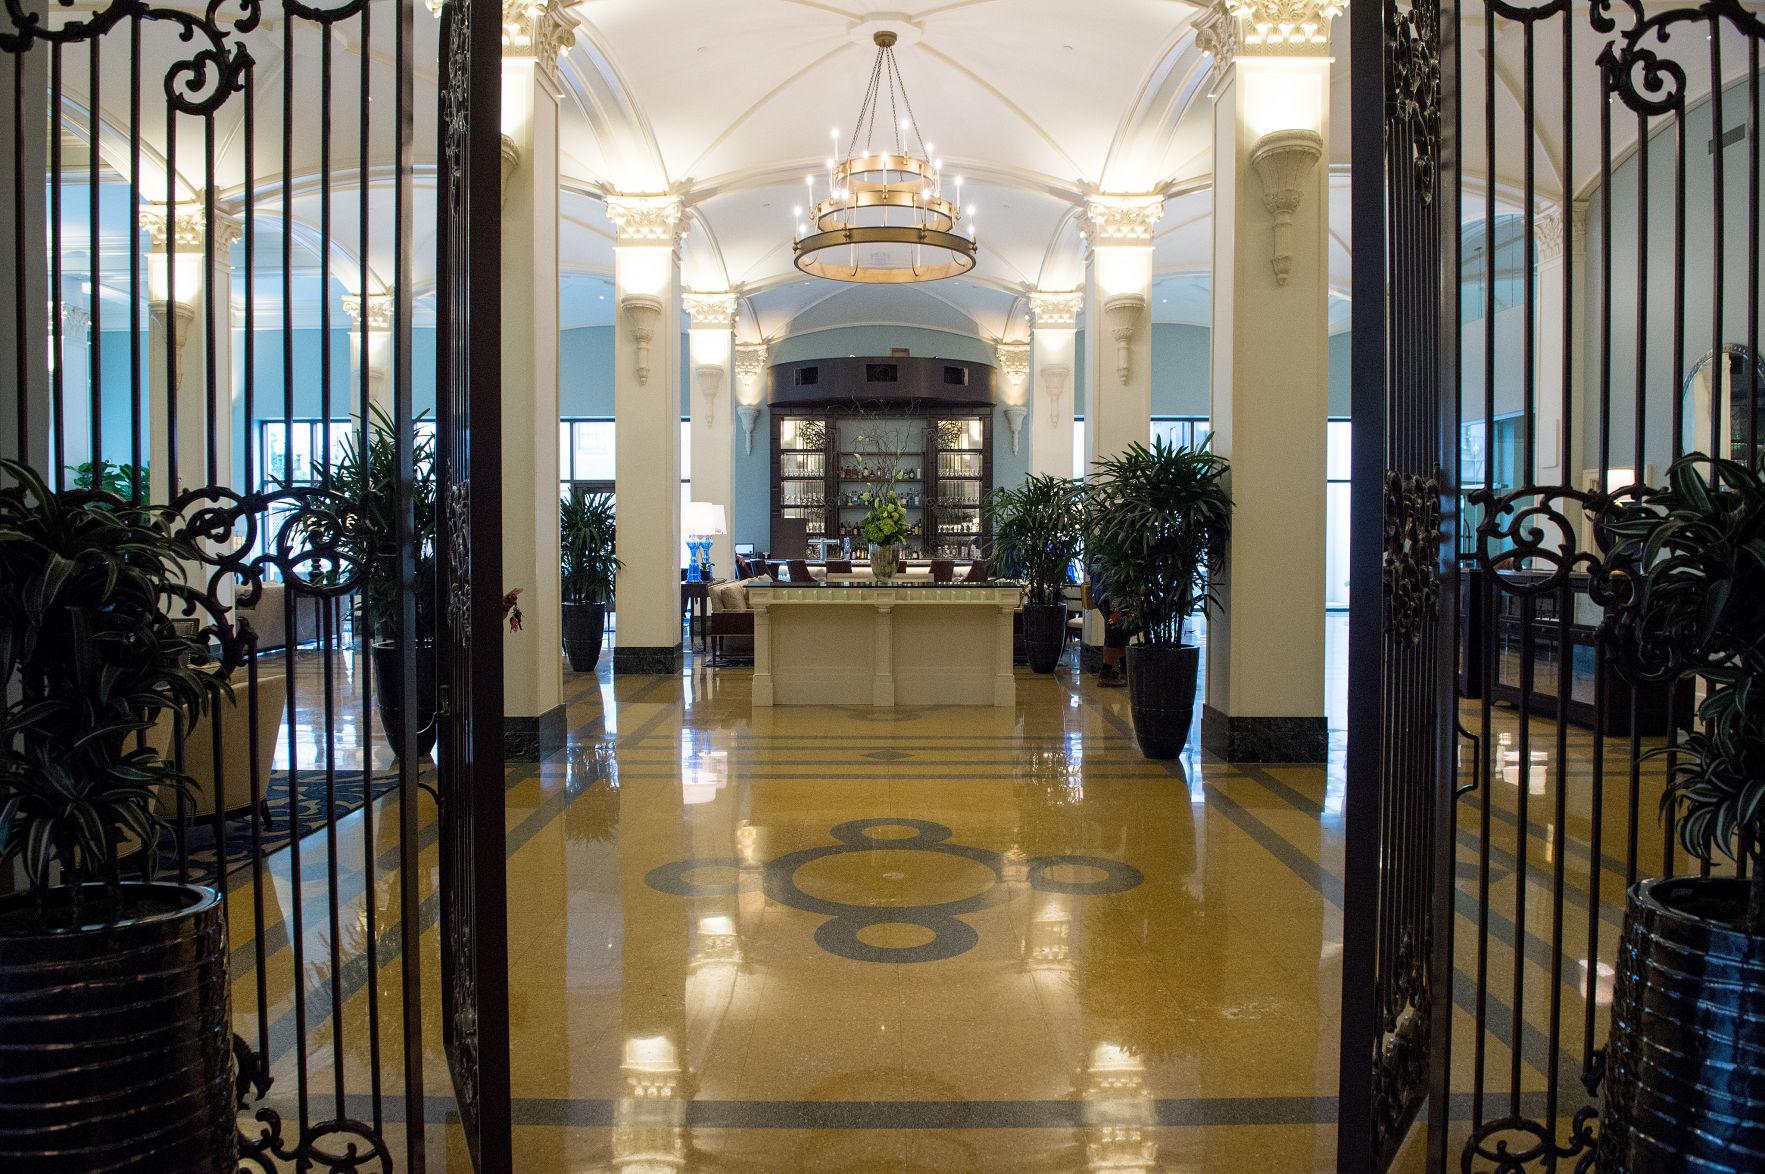 nonopsiadv013JPG NOPSI Hotel opens doors and a